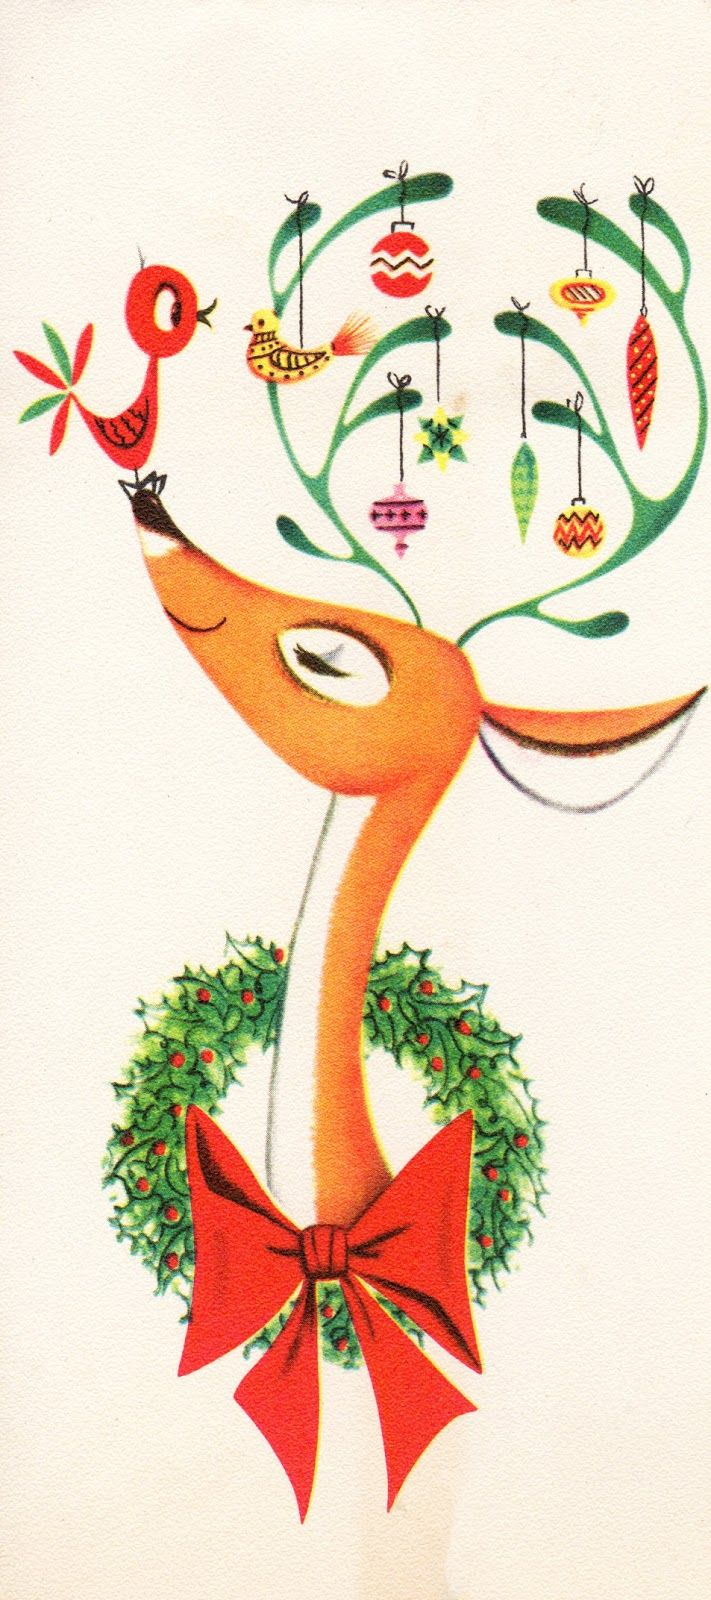 25 Best Ideas About Vintage Christmas On Pinterest